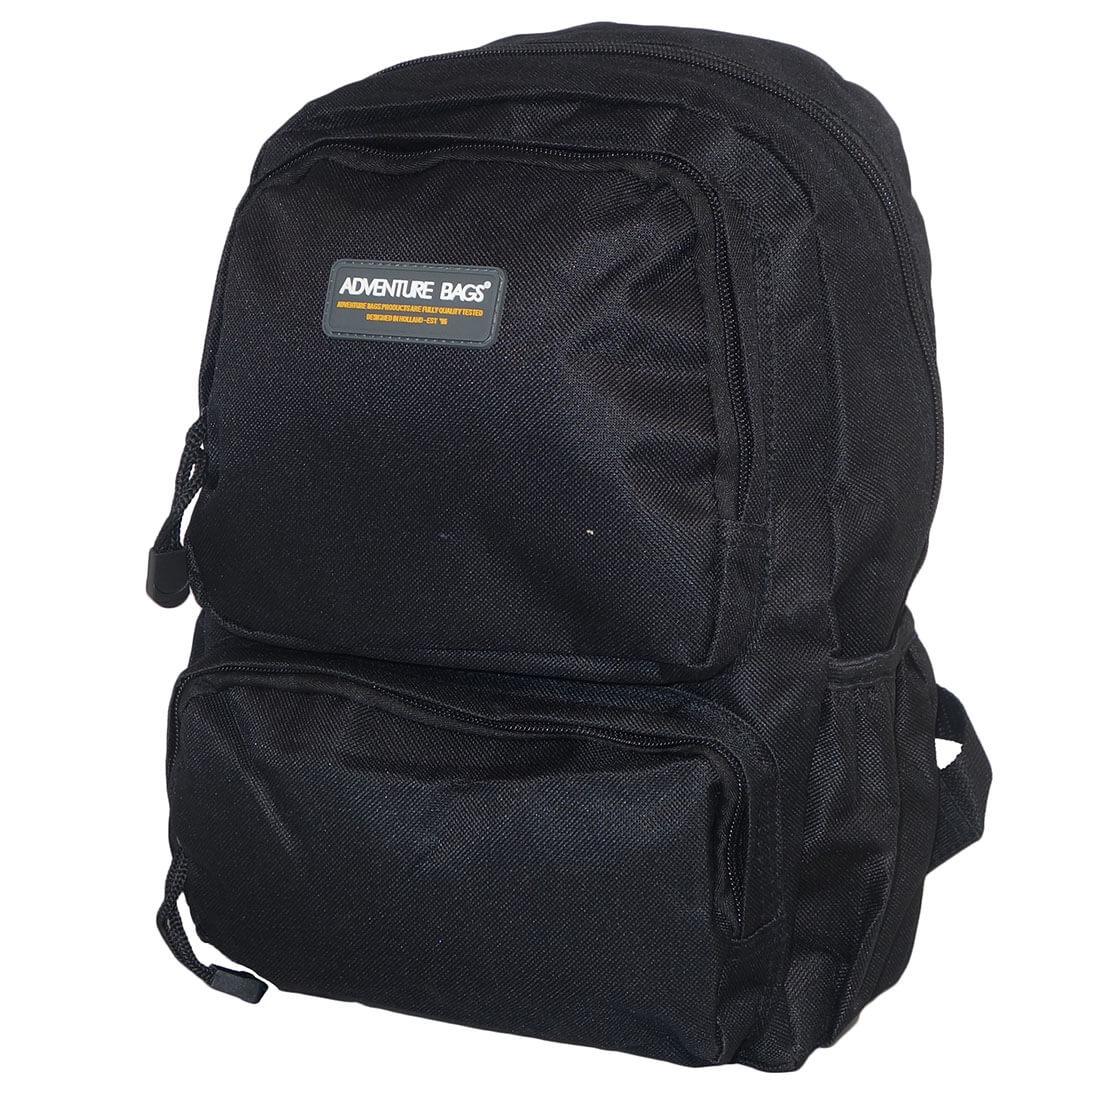 Adventure Bags Rugzak Zwart-0